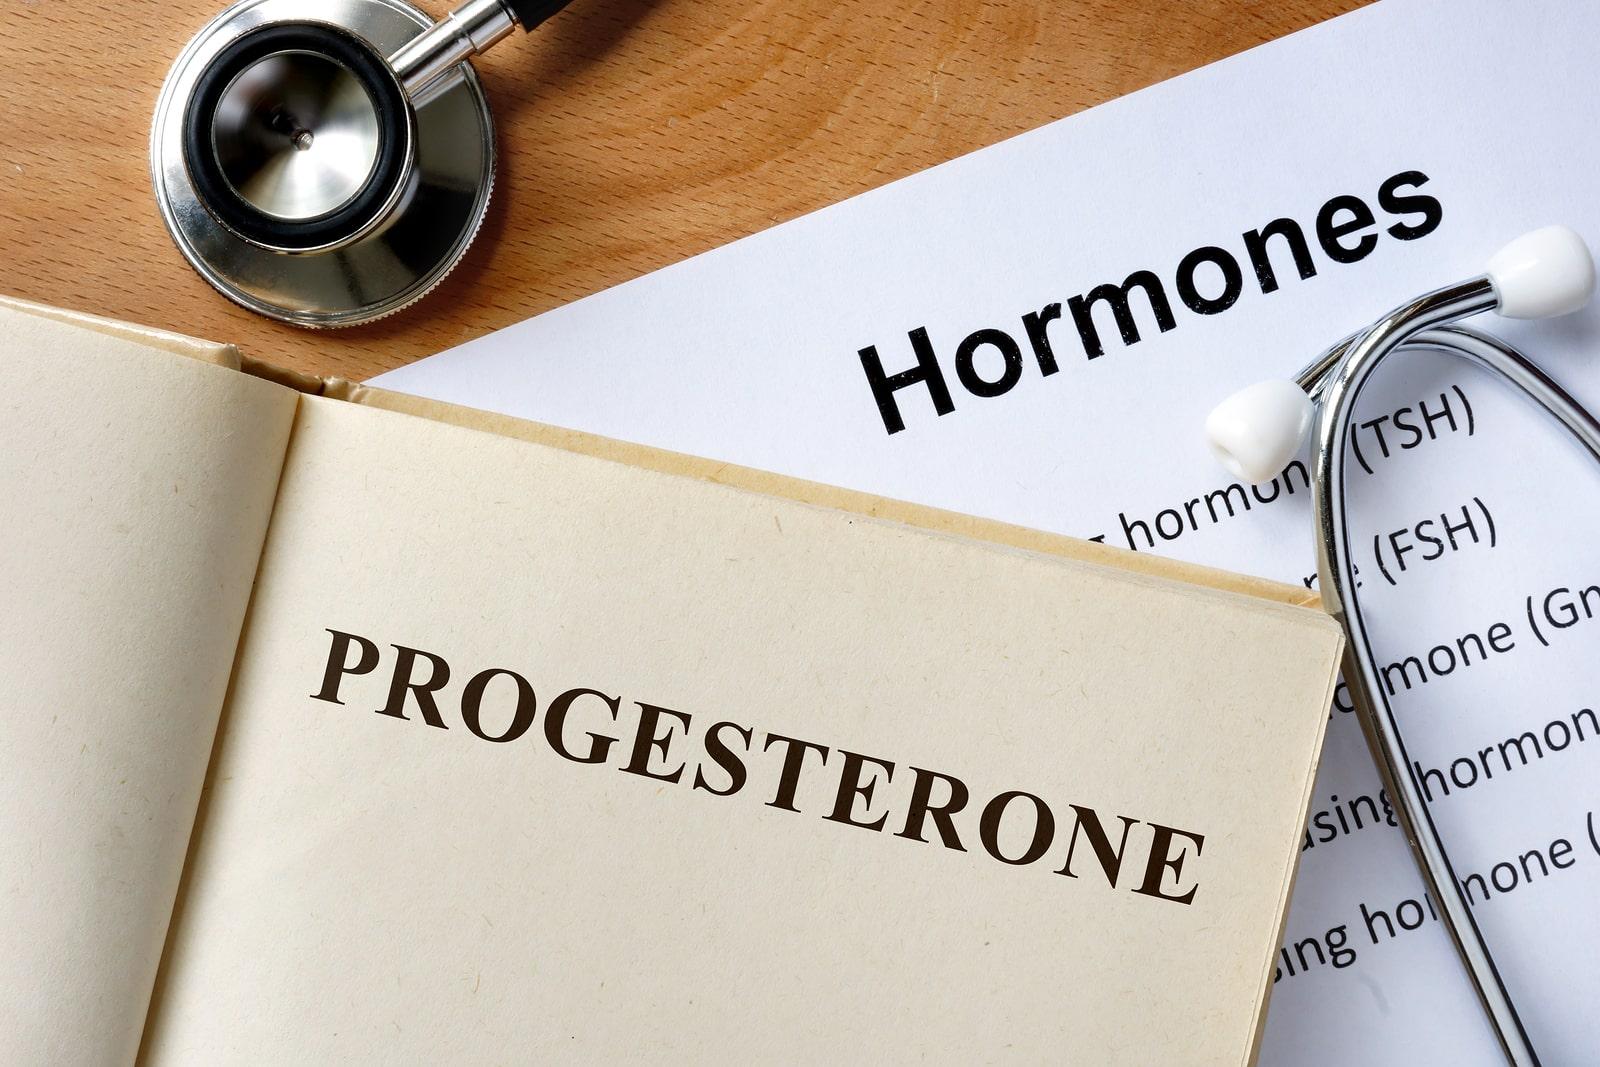 Increase Progesterone Naturally